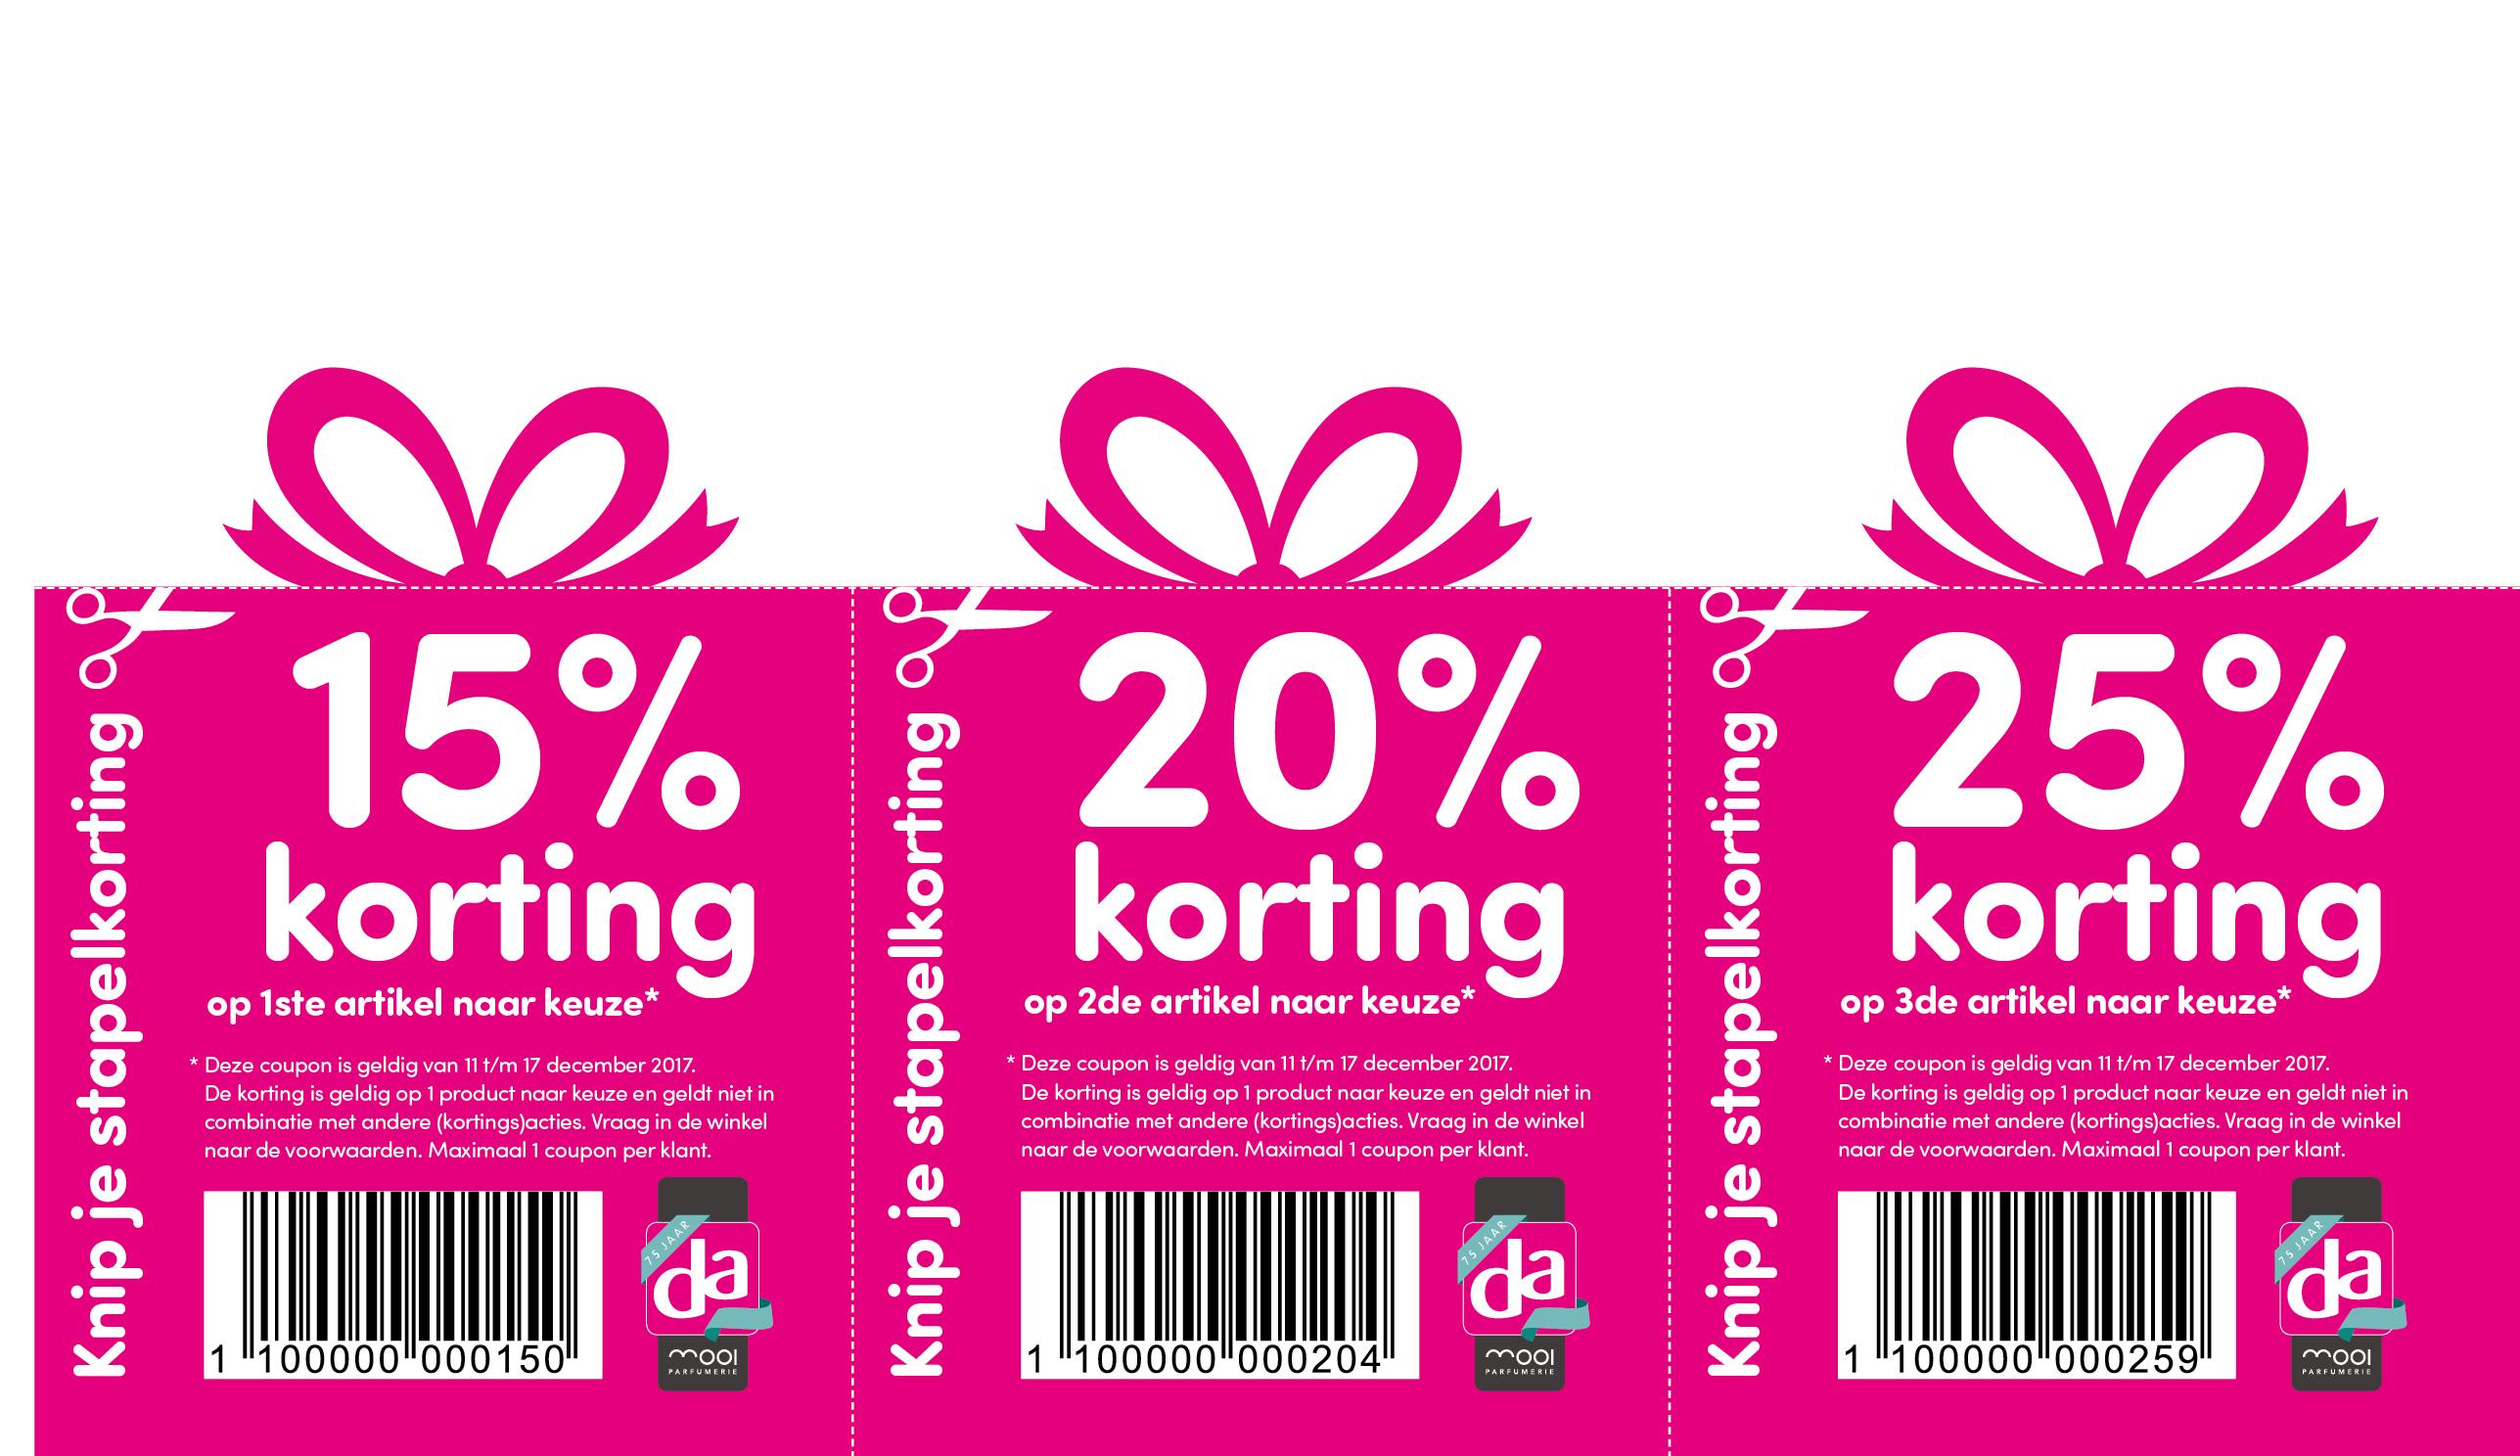 Kortingsbonnen tot 25% korting @ DA winkels